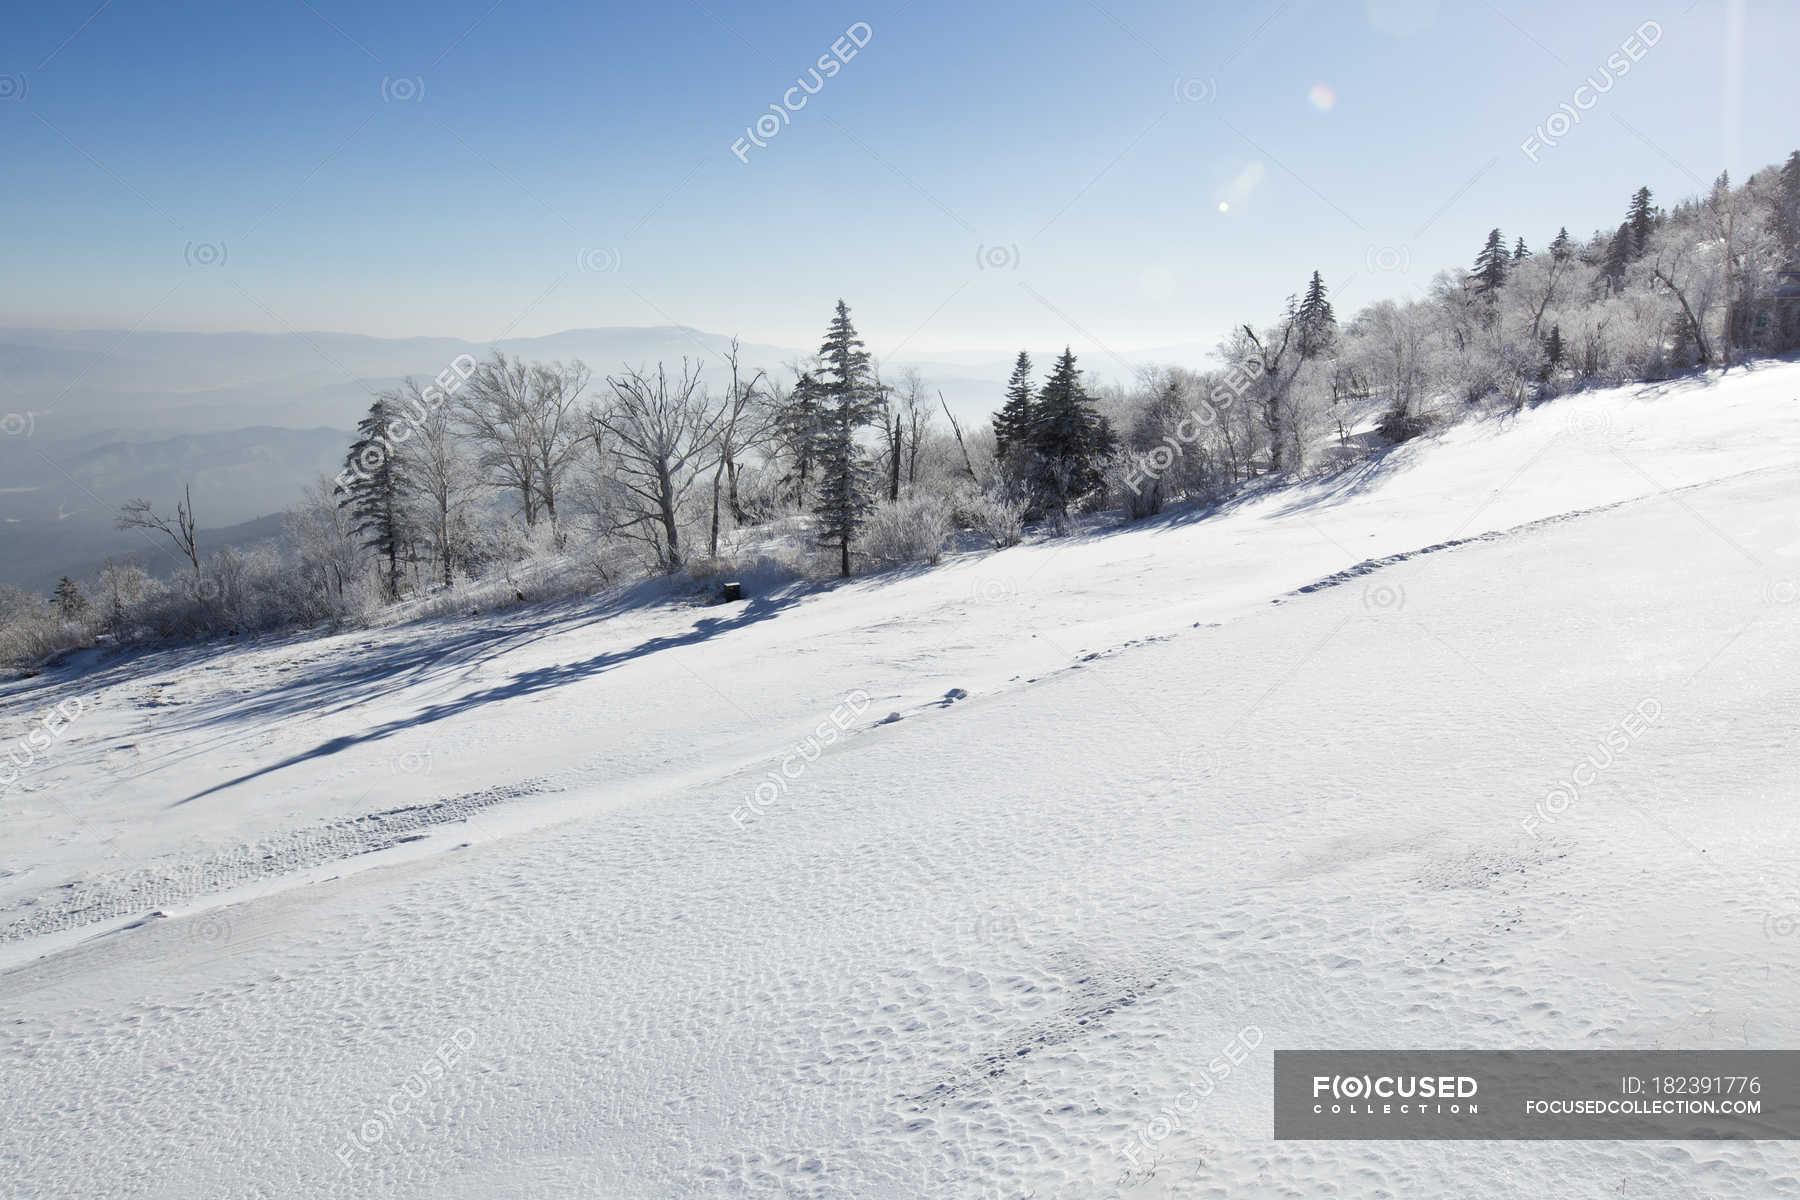 ski slope at winter resort in heilongjiang province, china